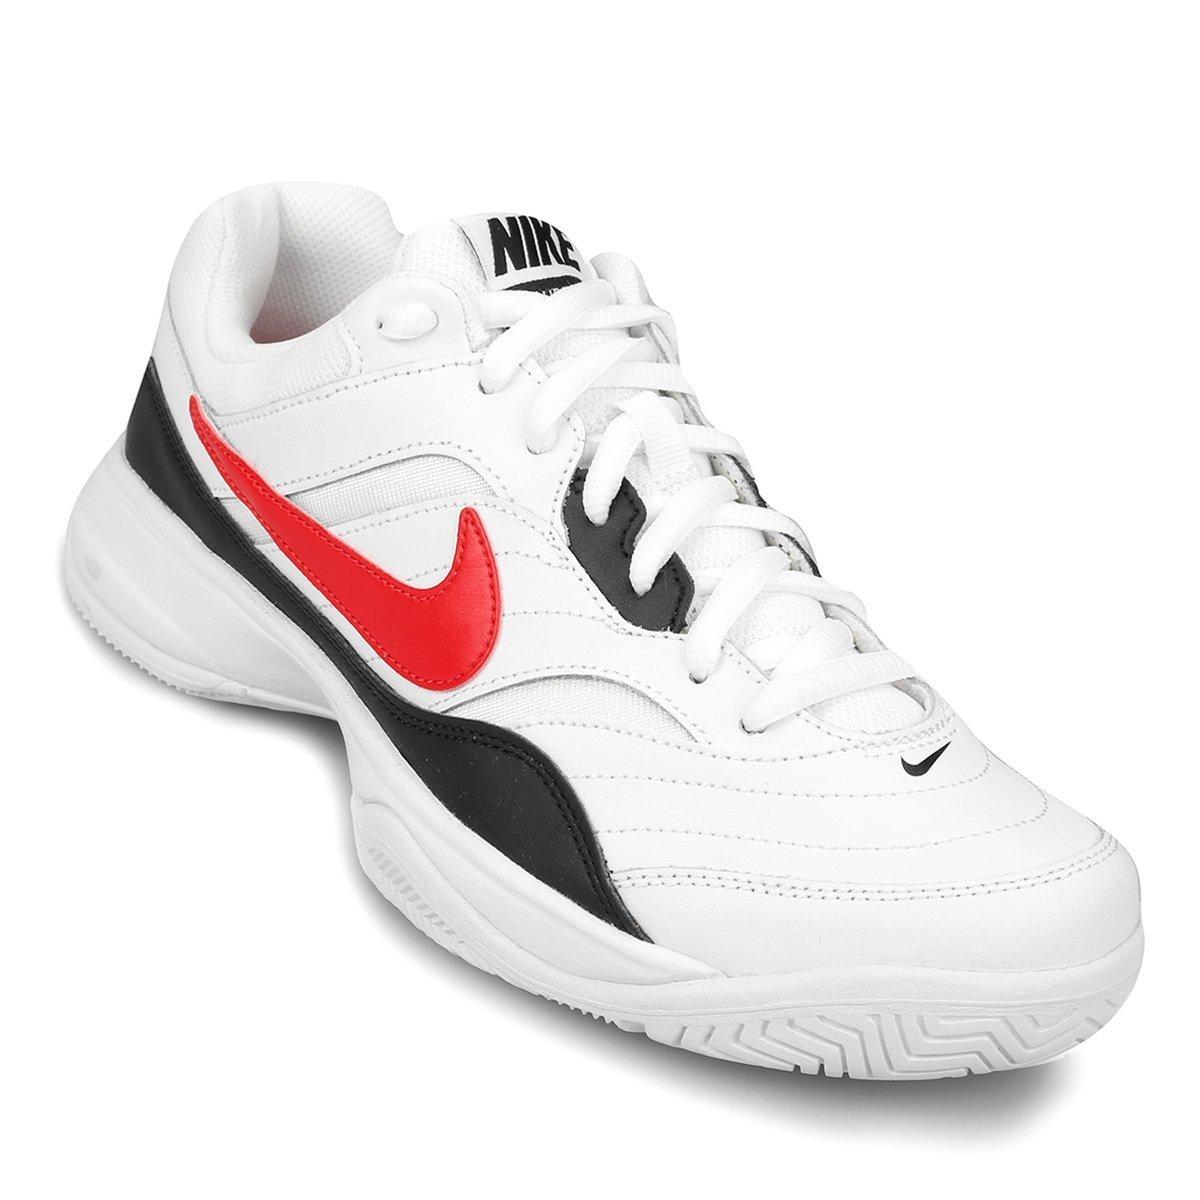 3b6f7197e23 zapatillas nike court lite - tenis -envios gratis - oferta-. Cargando zoom.